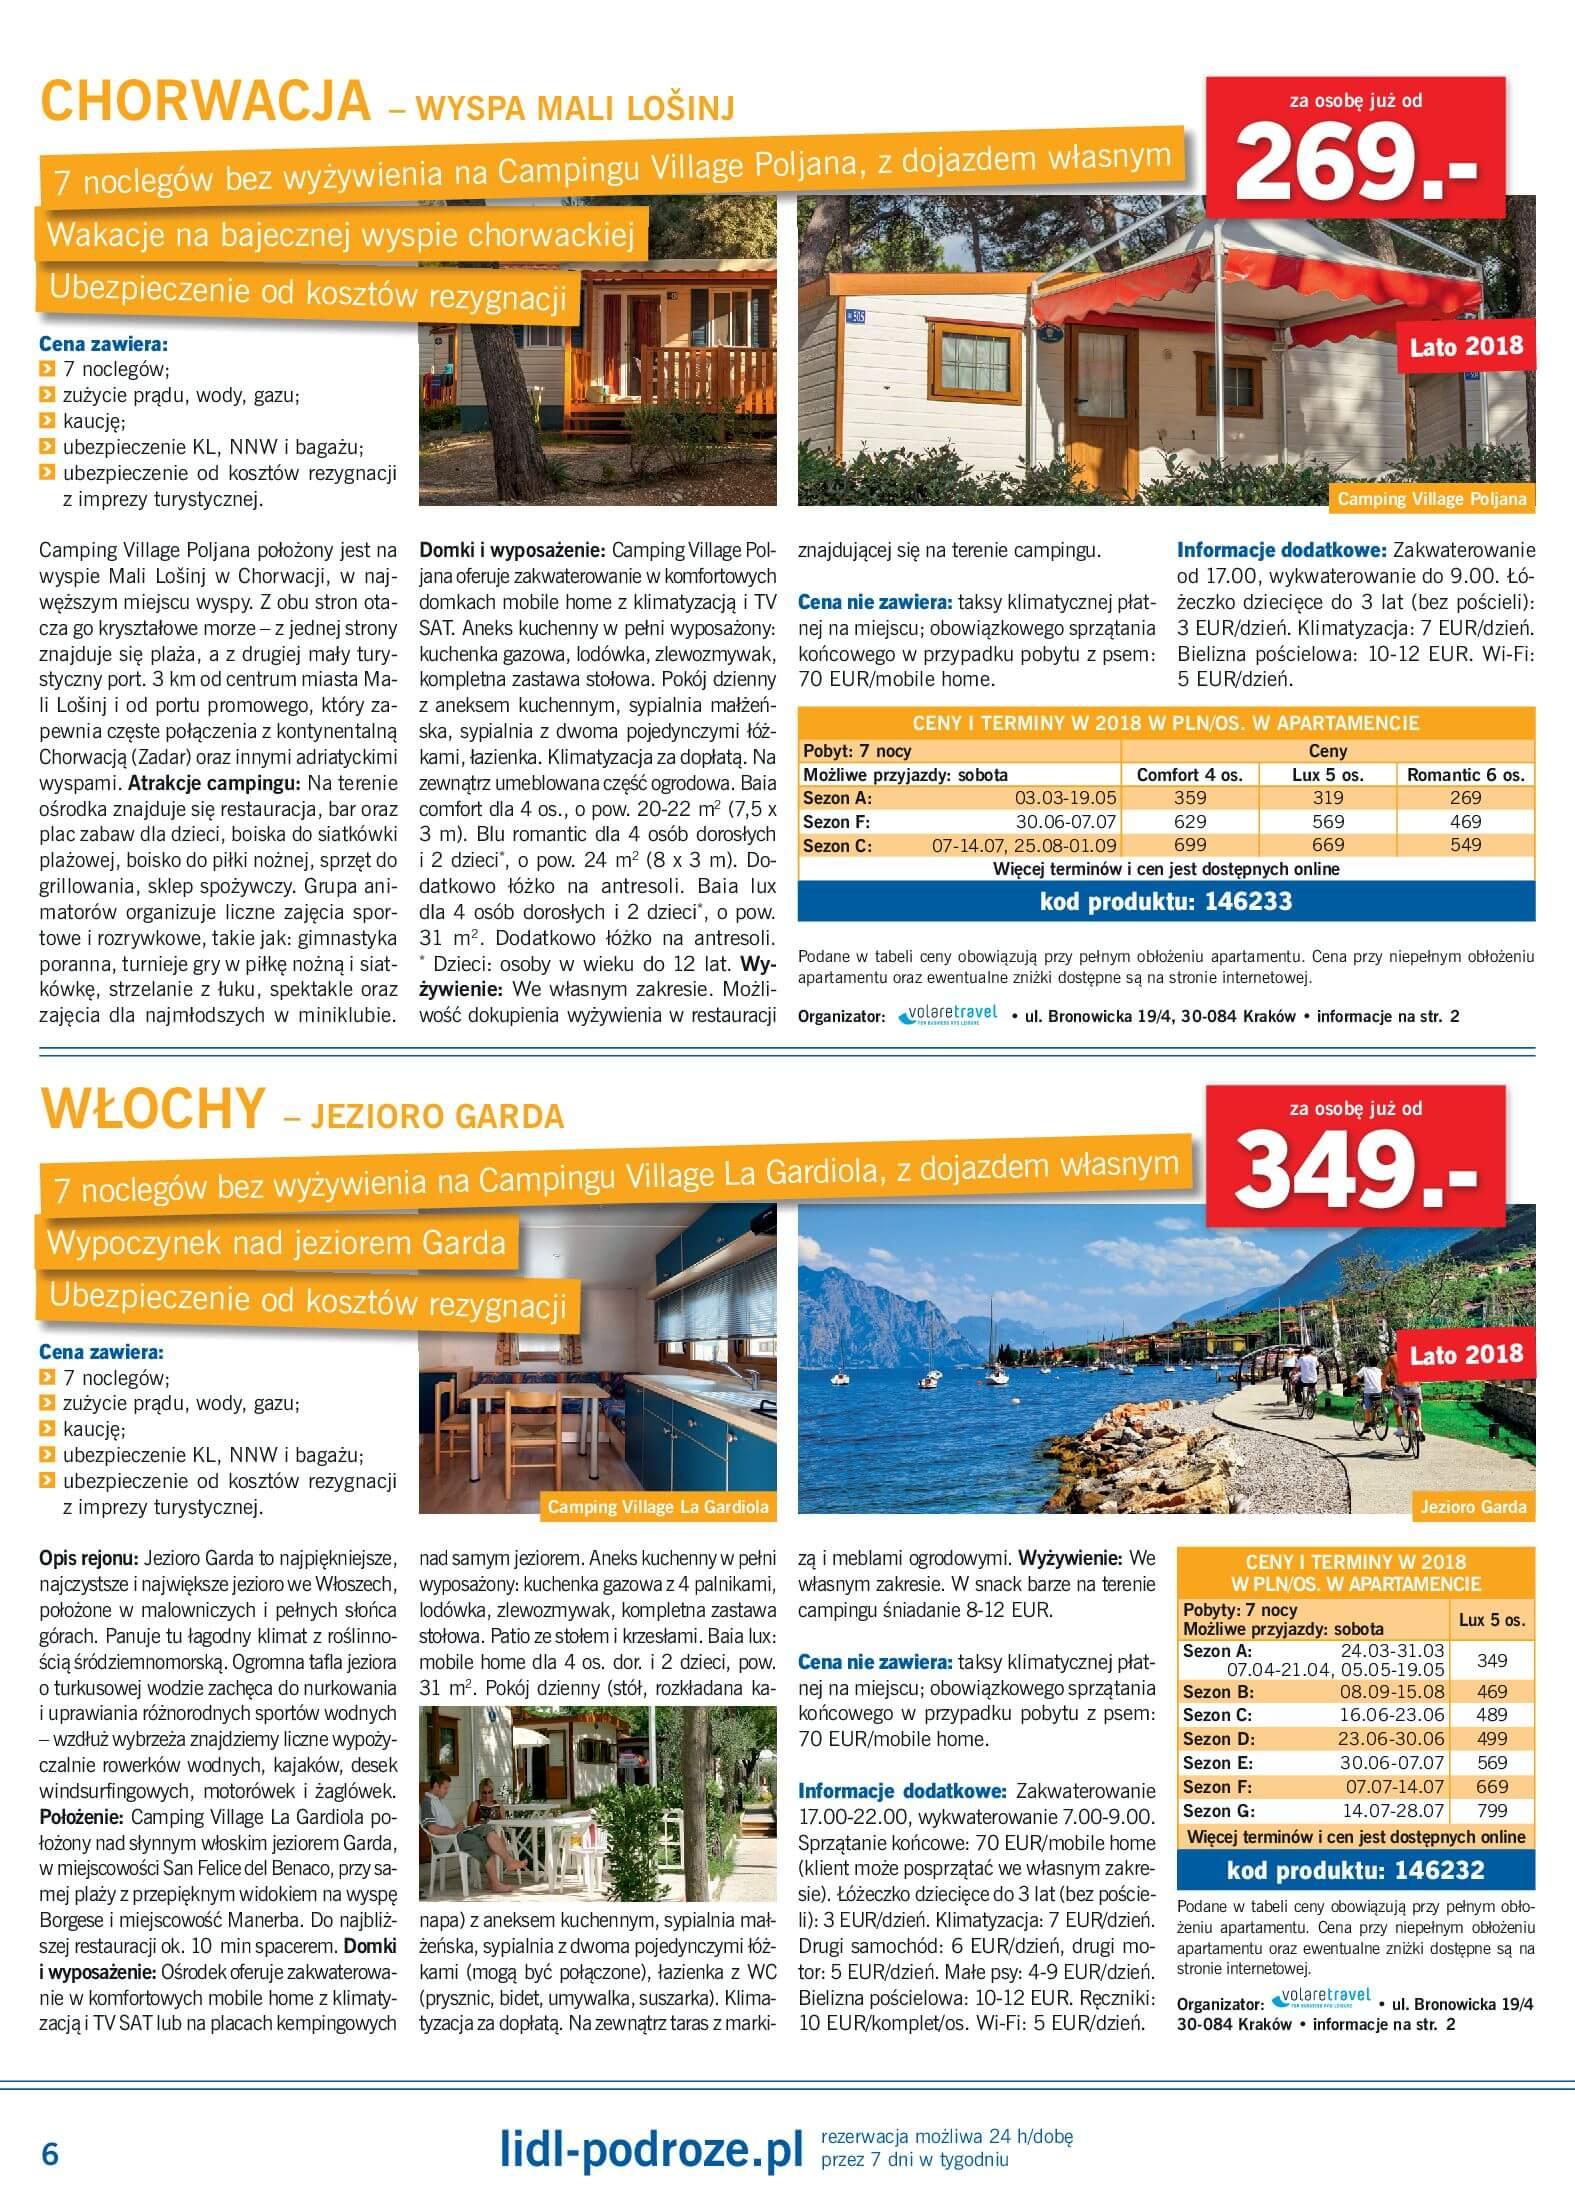 Gazetka Lidl - Lidl podróże-31.12.2017-28.01.2018-page-6